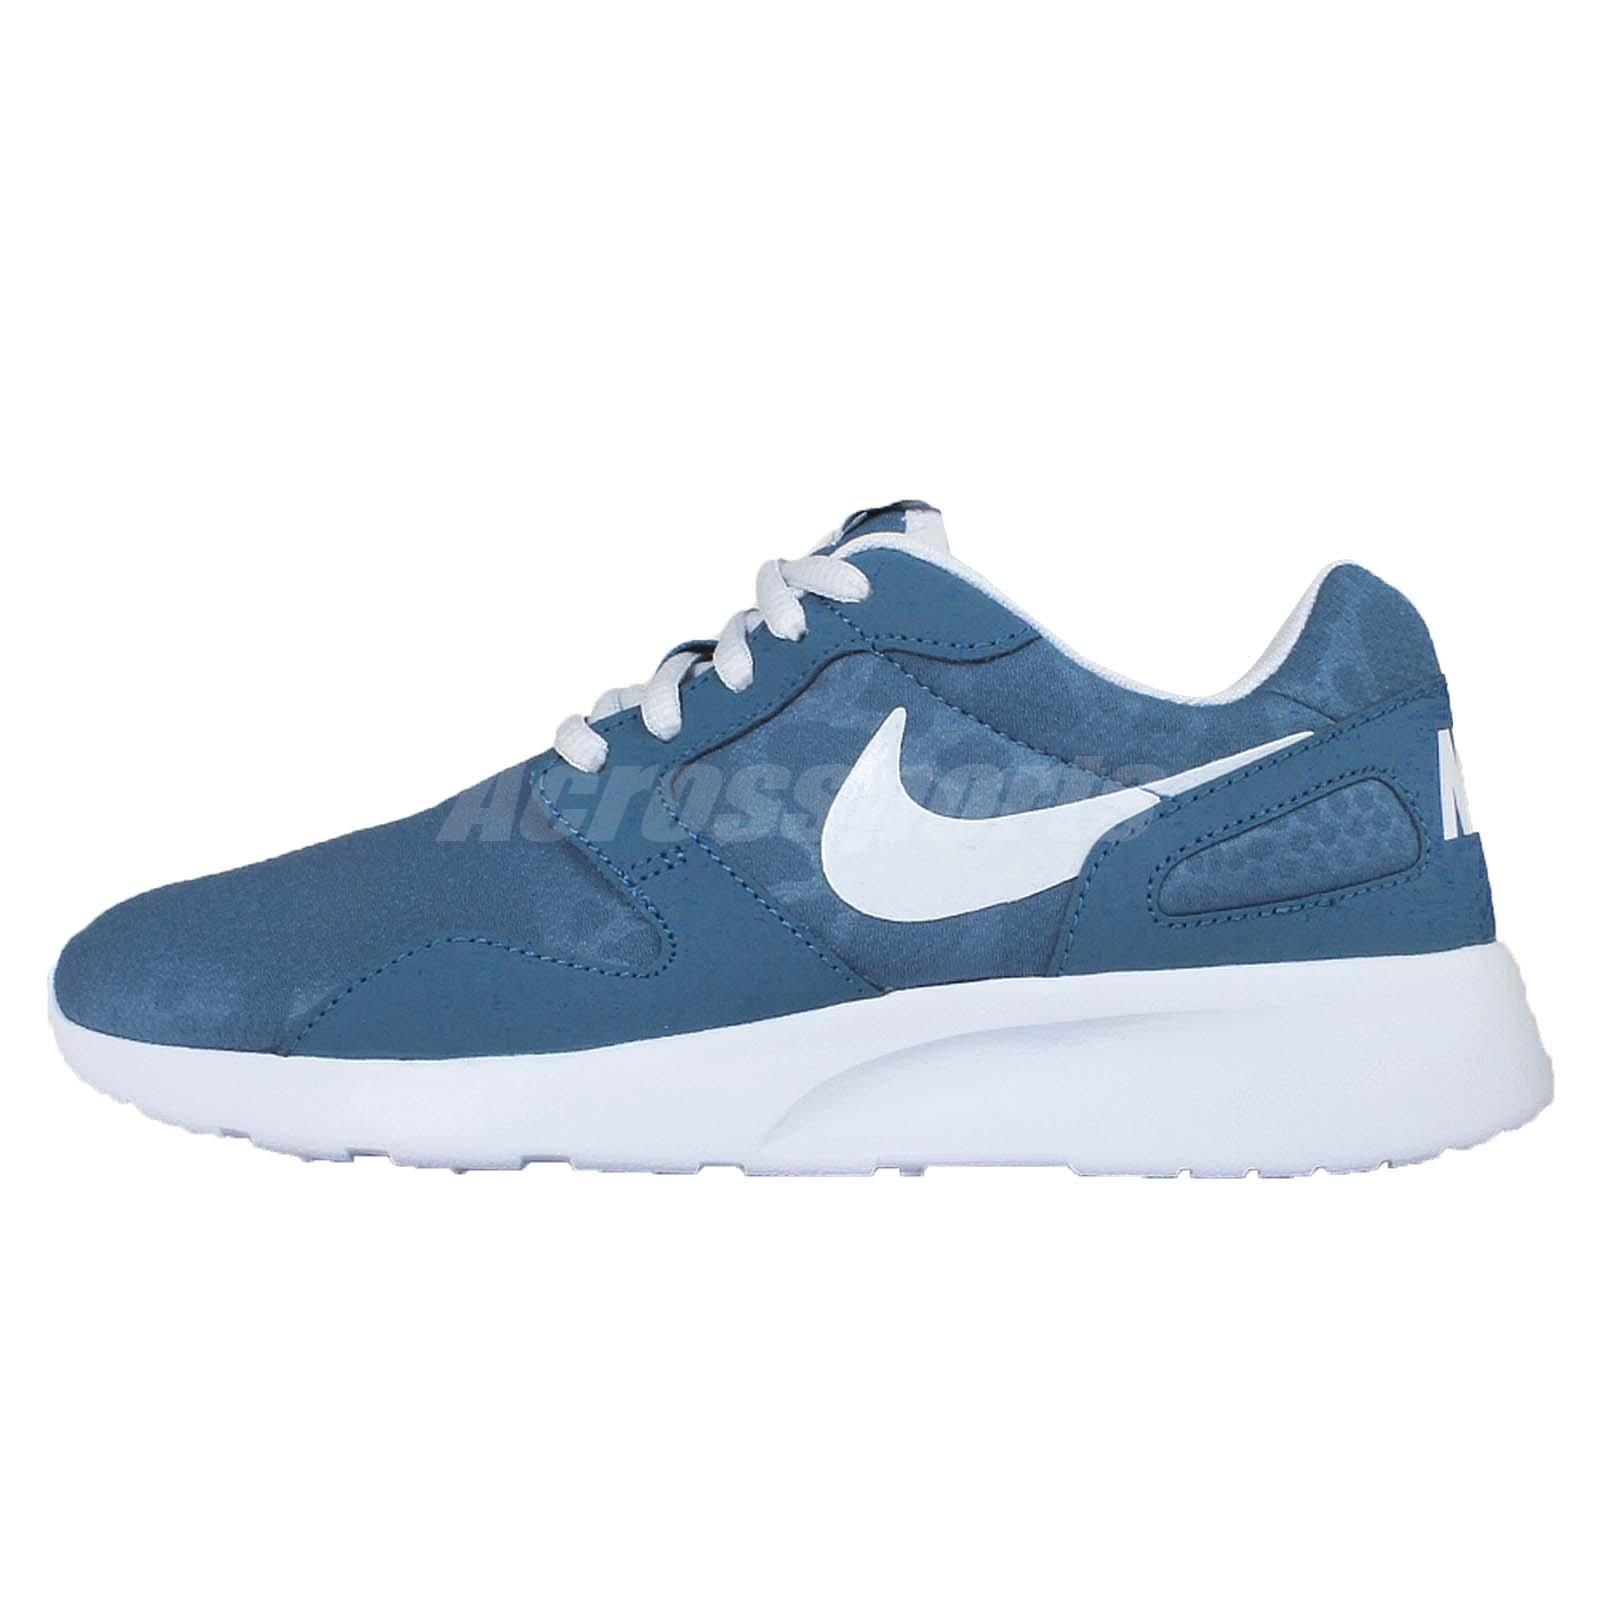 wmns nike kaishi print leopard blue white womens running